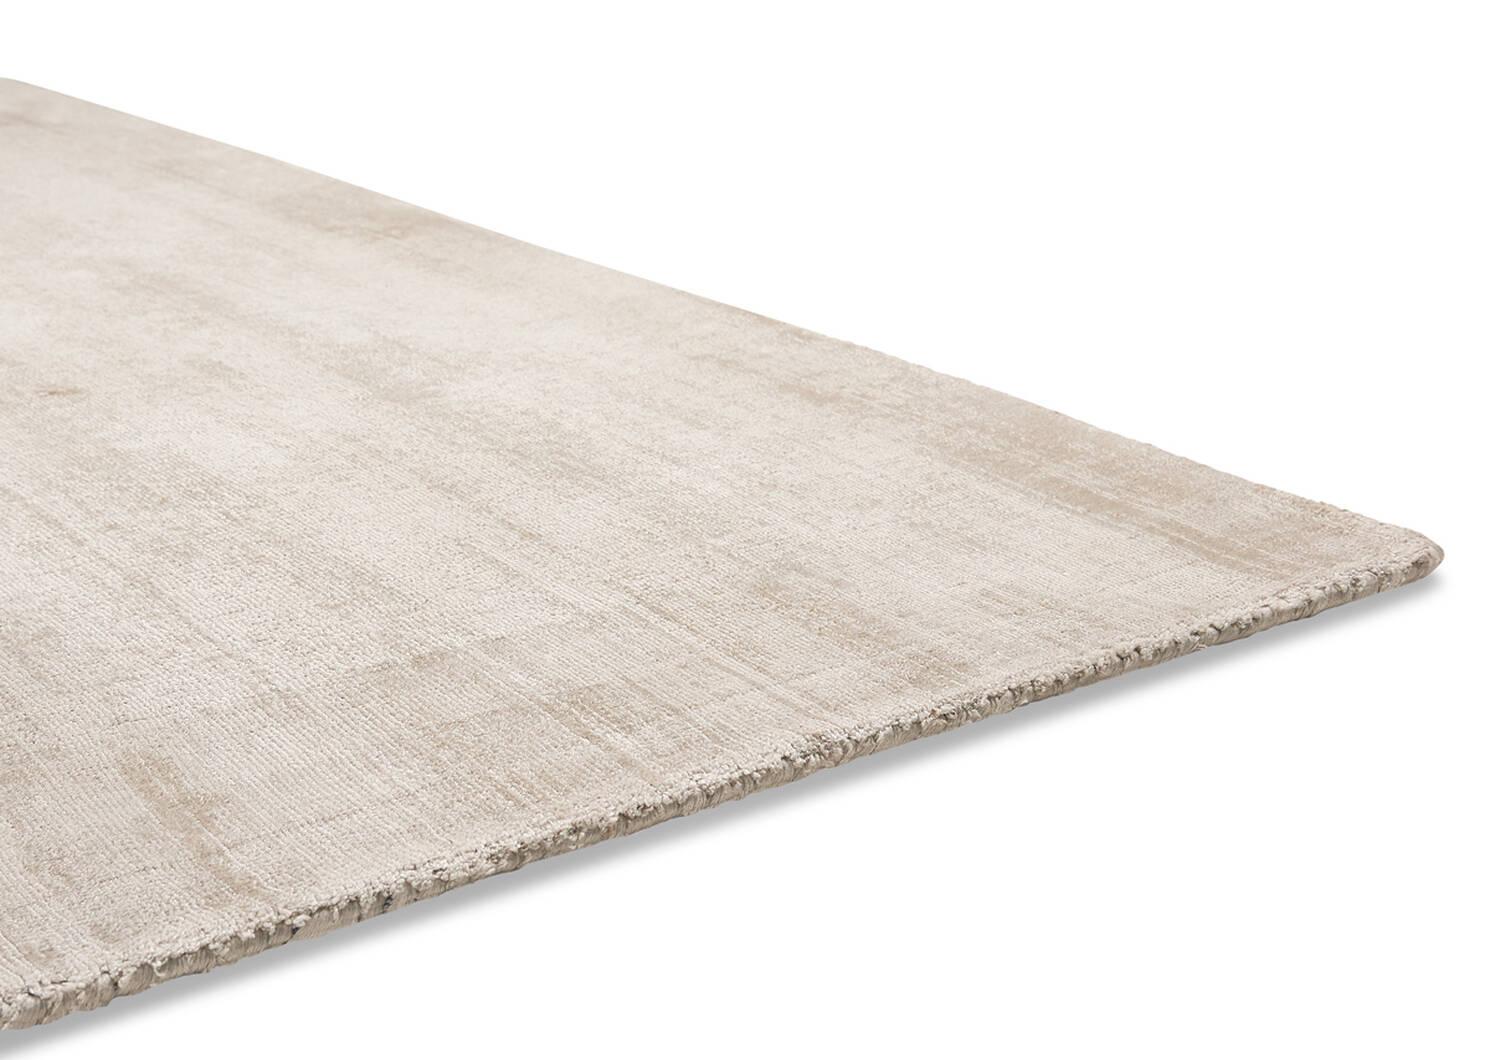 Antique Rug 96x120 Sand